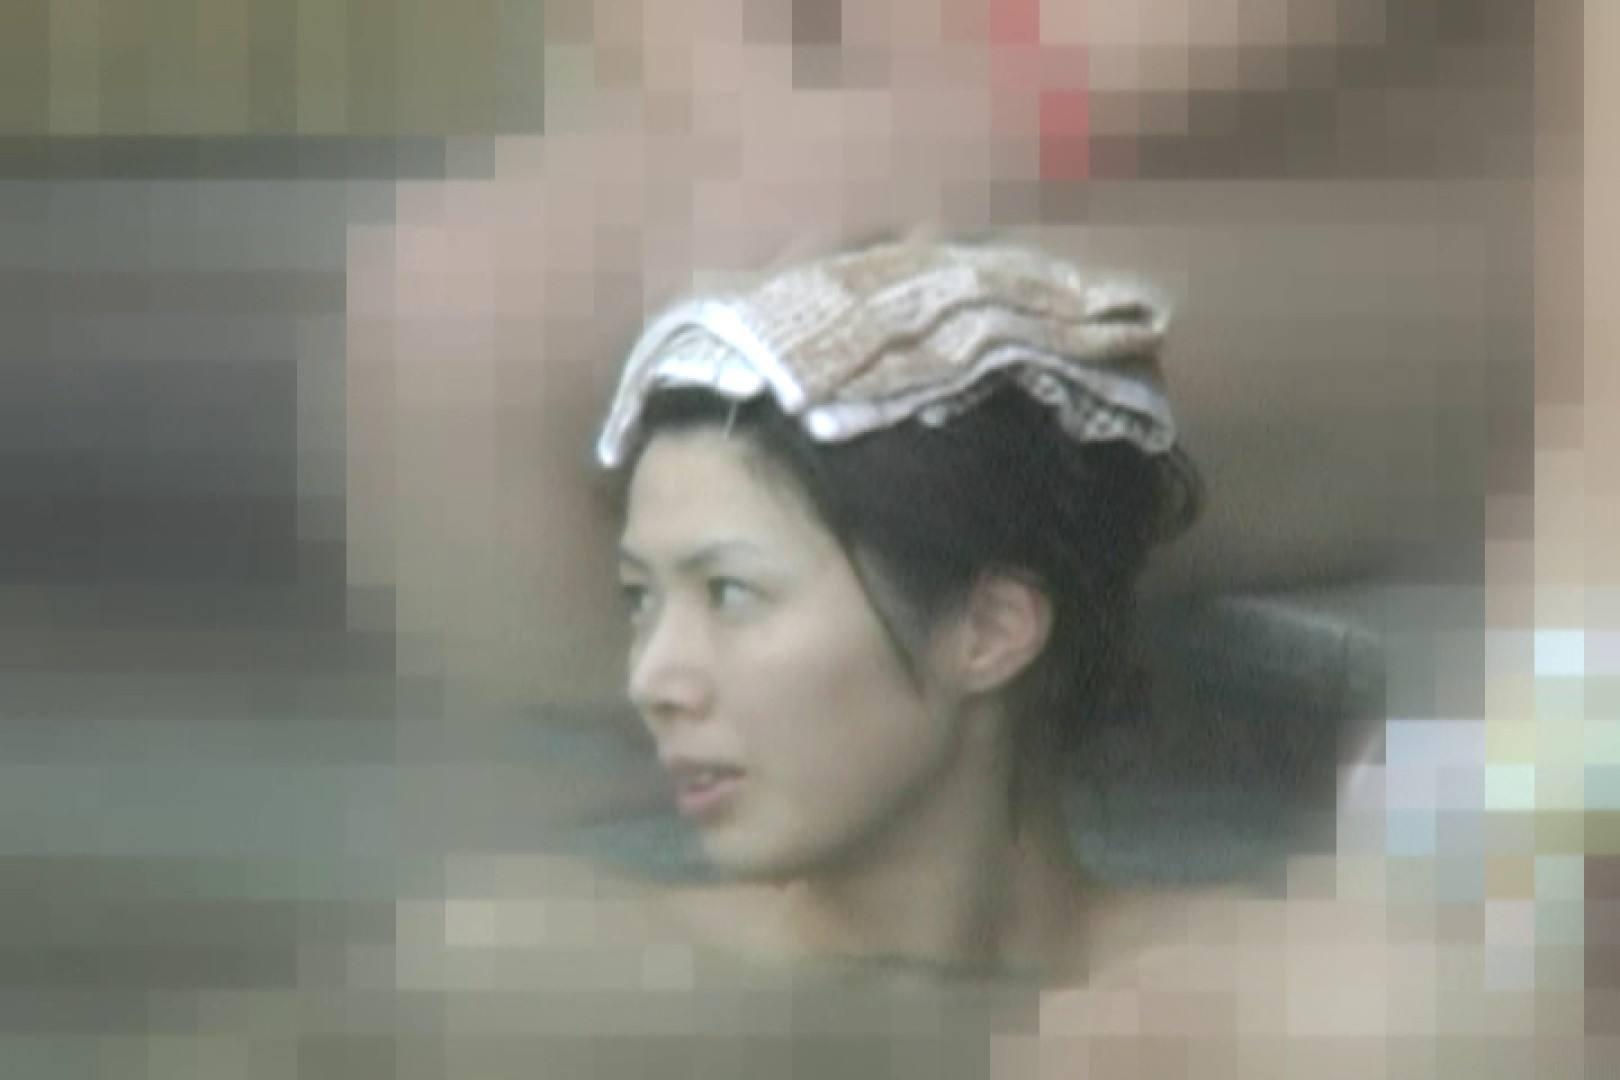 Aquaな露天風呂Vol.856 OLのエロ生活 SEX無修正画像 74連発 47